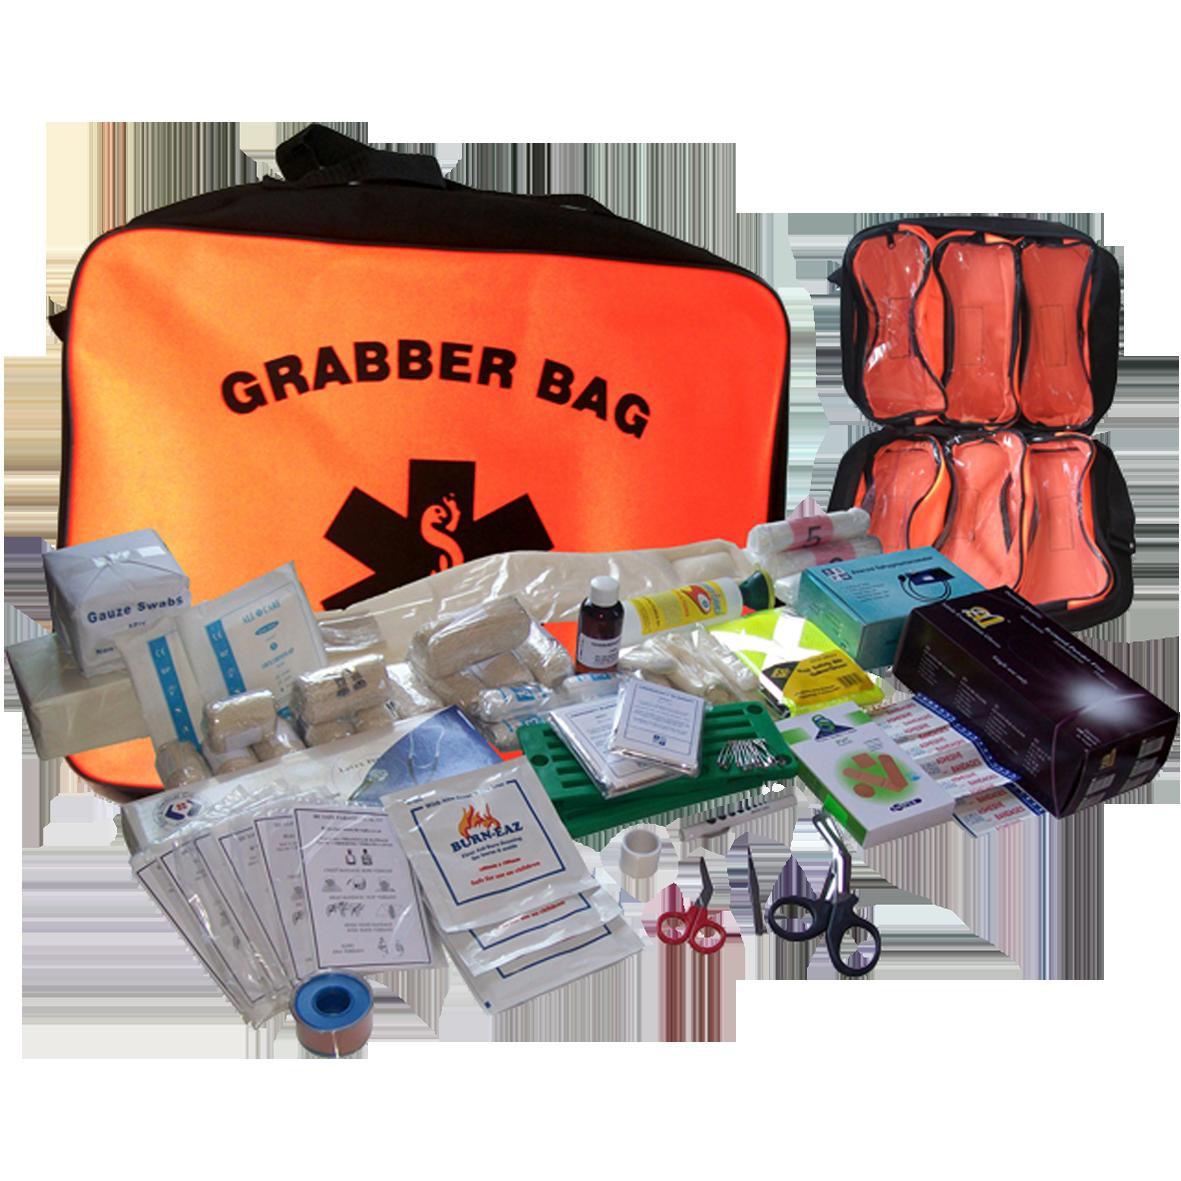 Utility in a Grab Bag